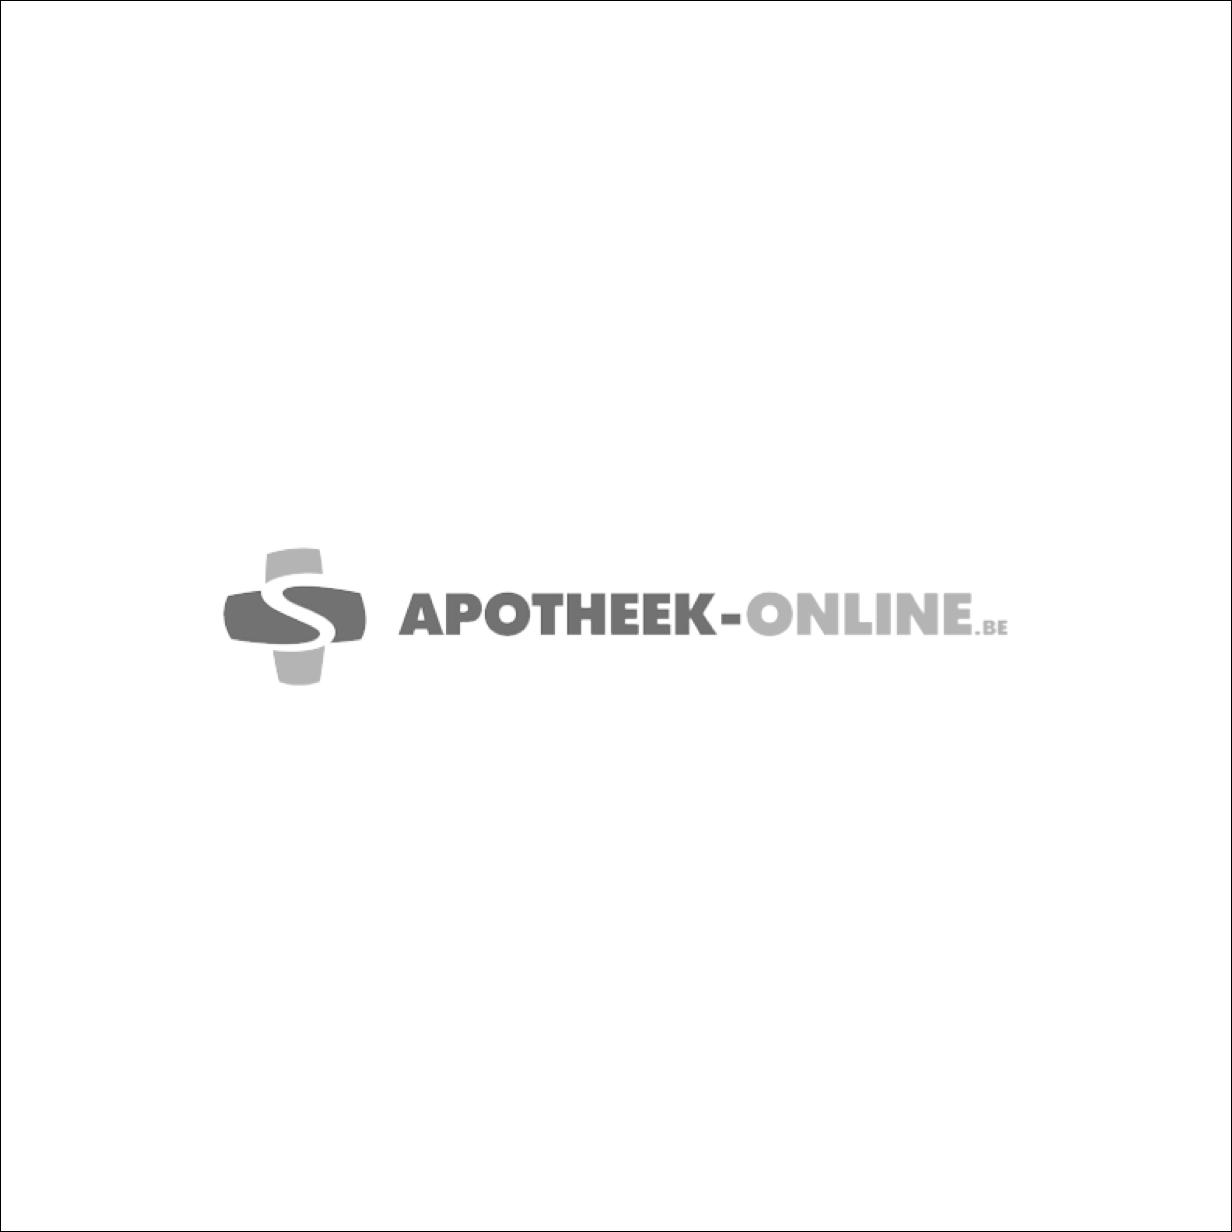 RC VDIET GASTRO INTESTINAL CANINE 12X400GR